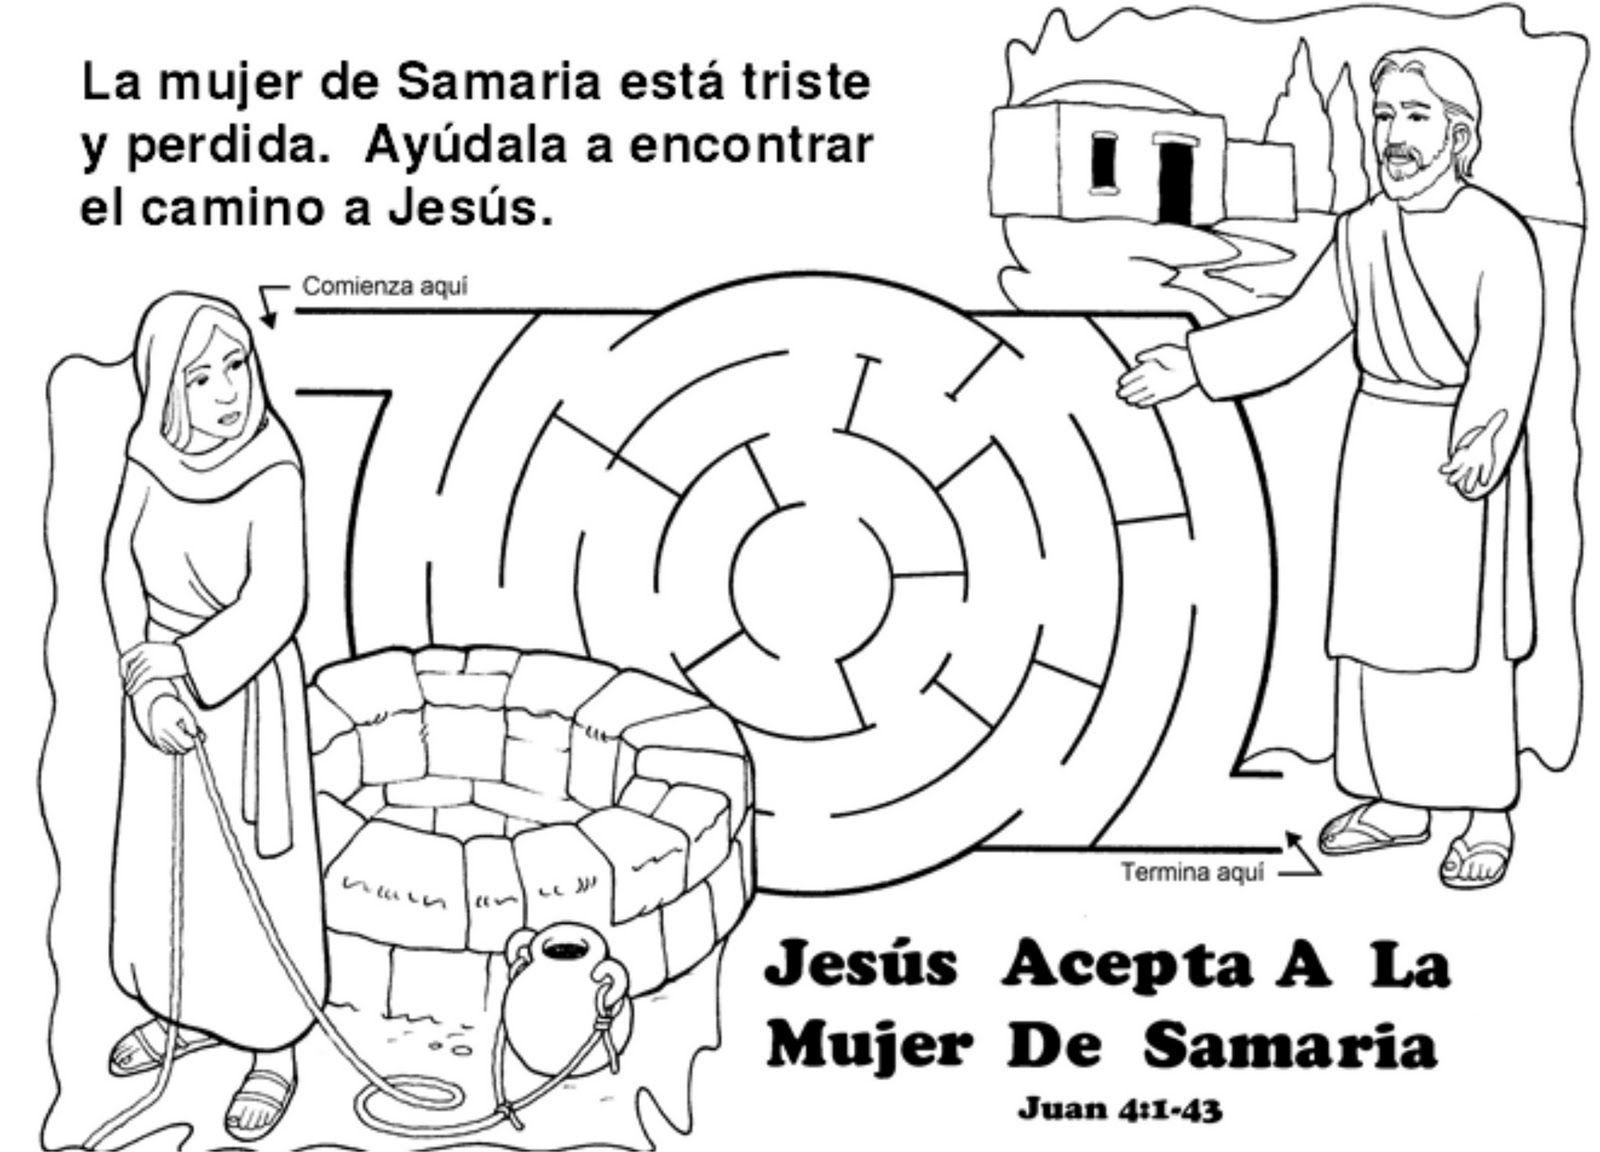 Dibujos De La Biblia Para Colorear E Imprimir: Dibujos Biblicos Para Colorear E Imprimir